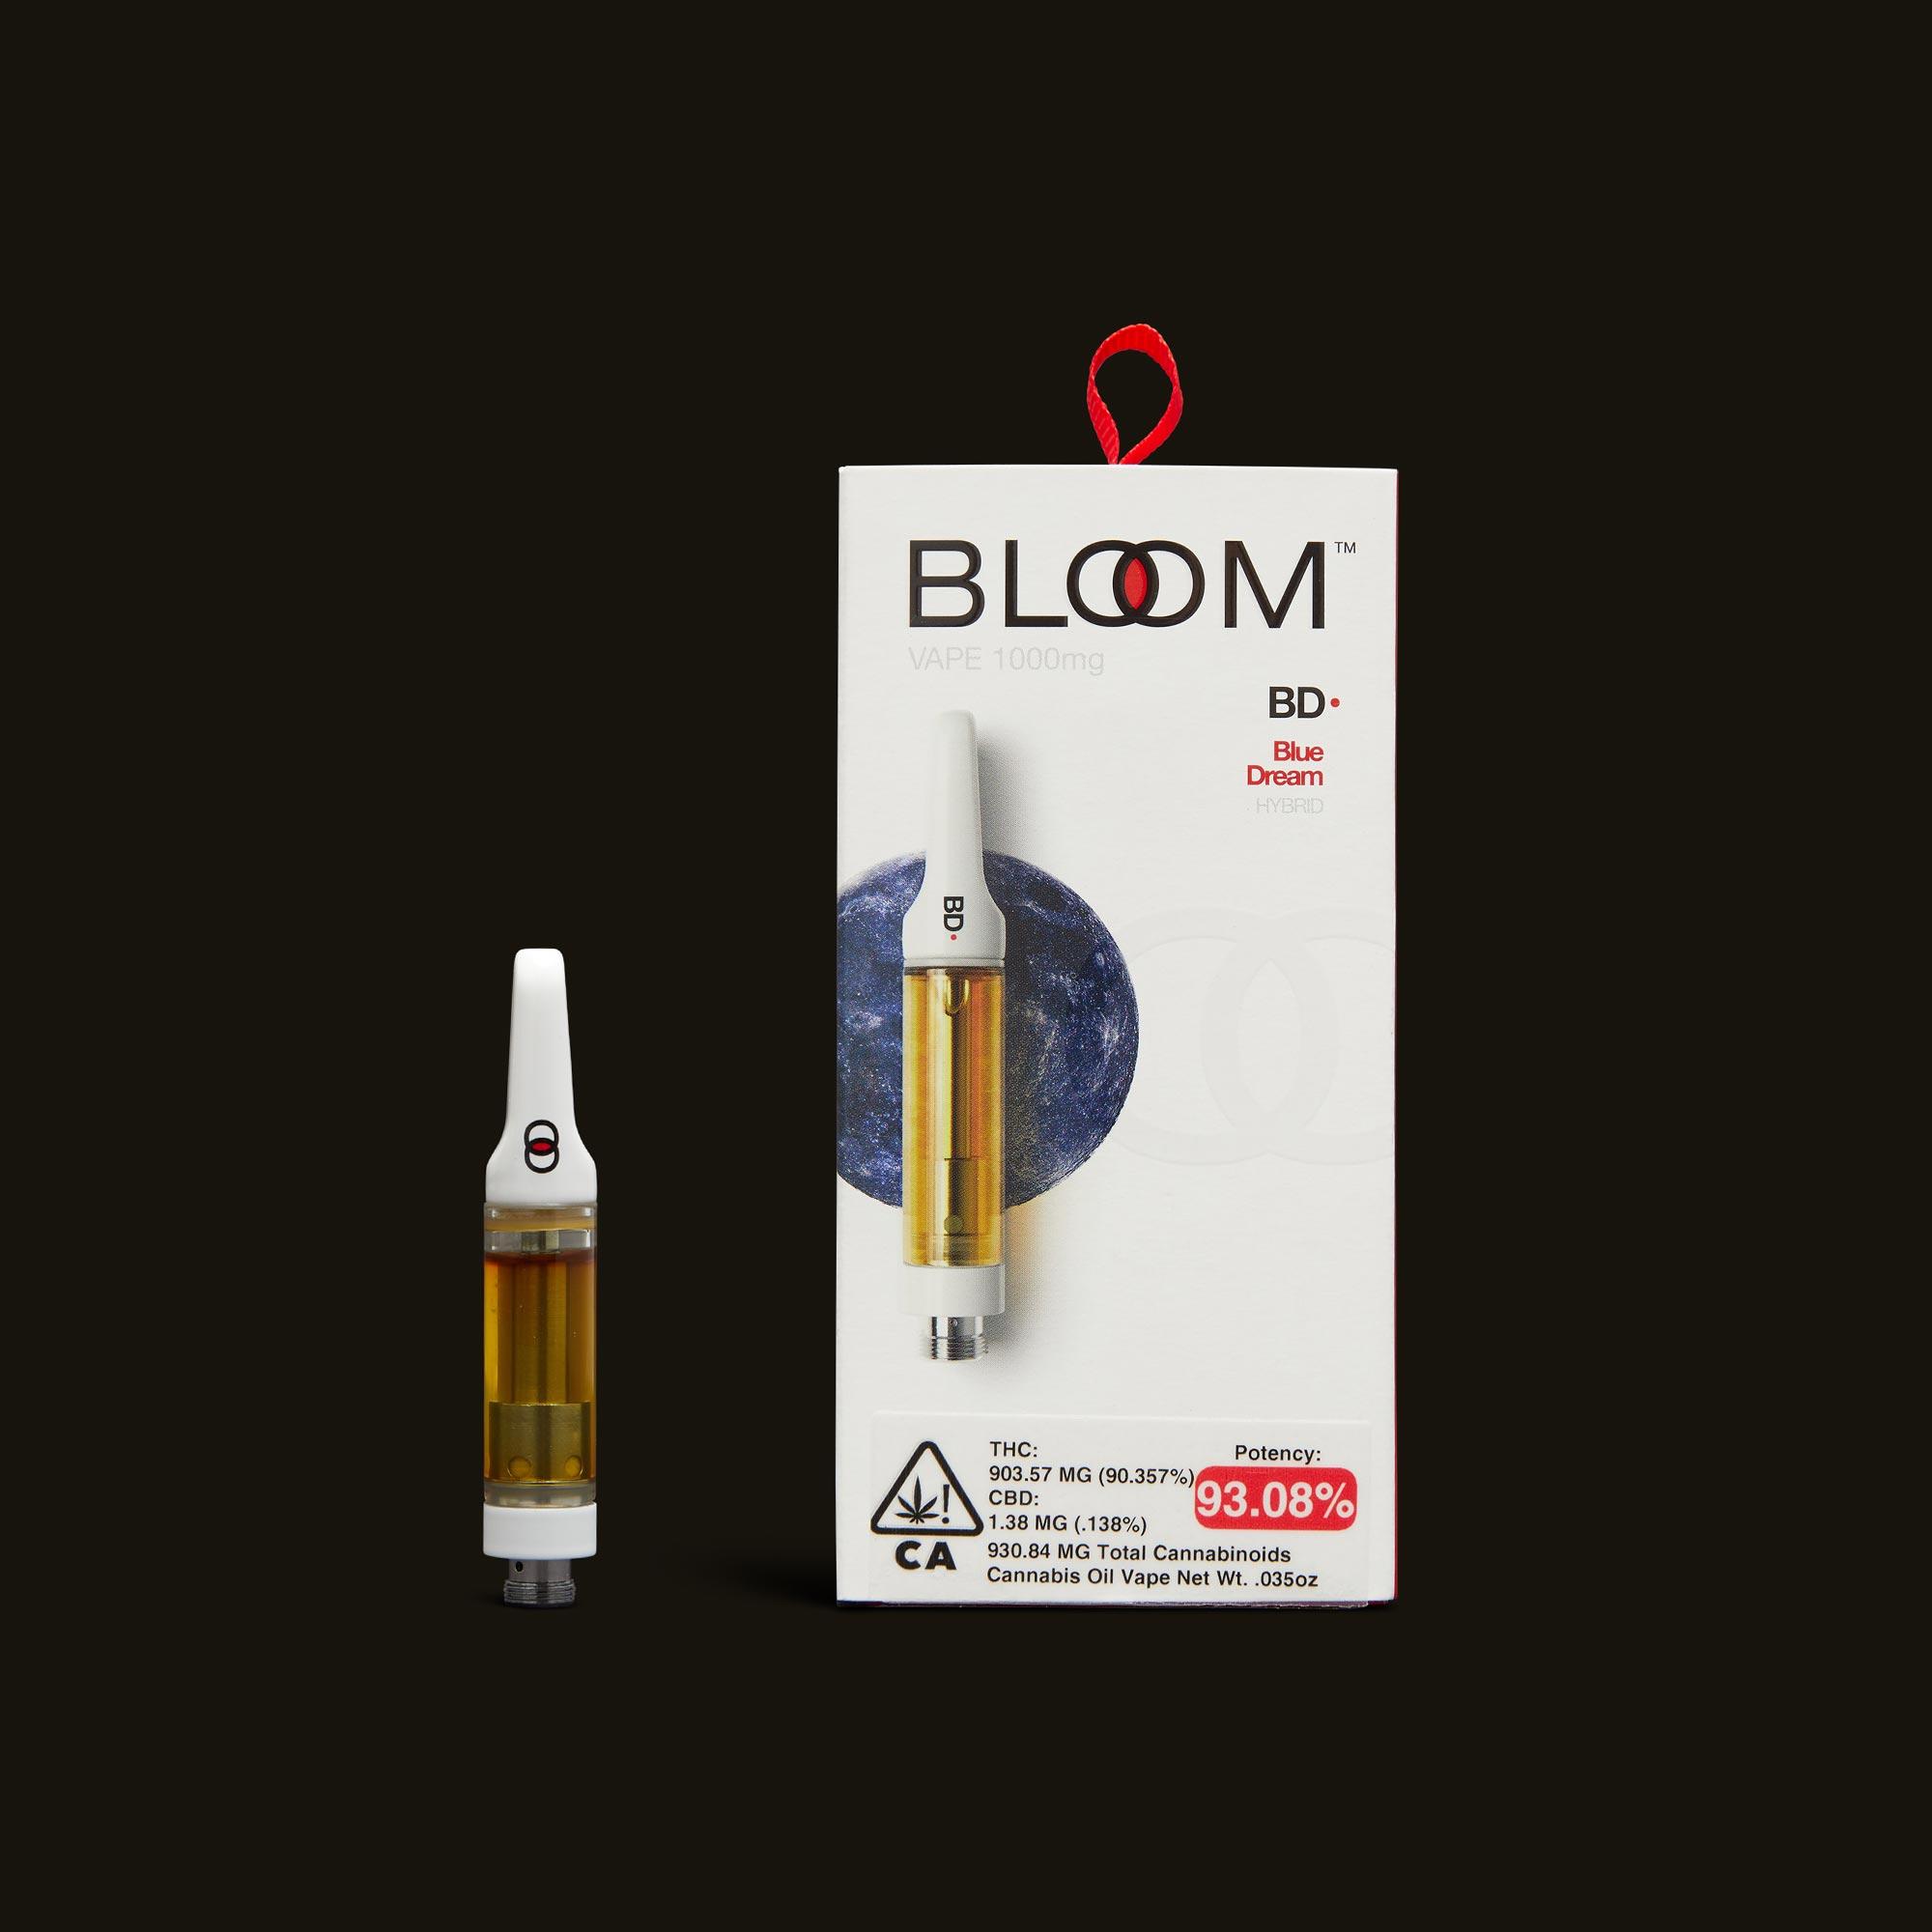 Blue Dream Cartridge - 1g by Bloom Brands